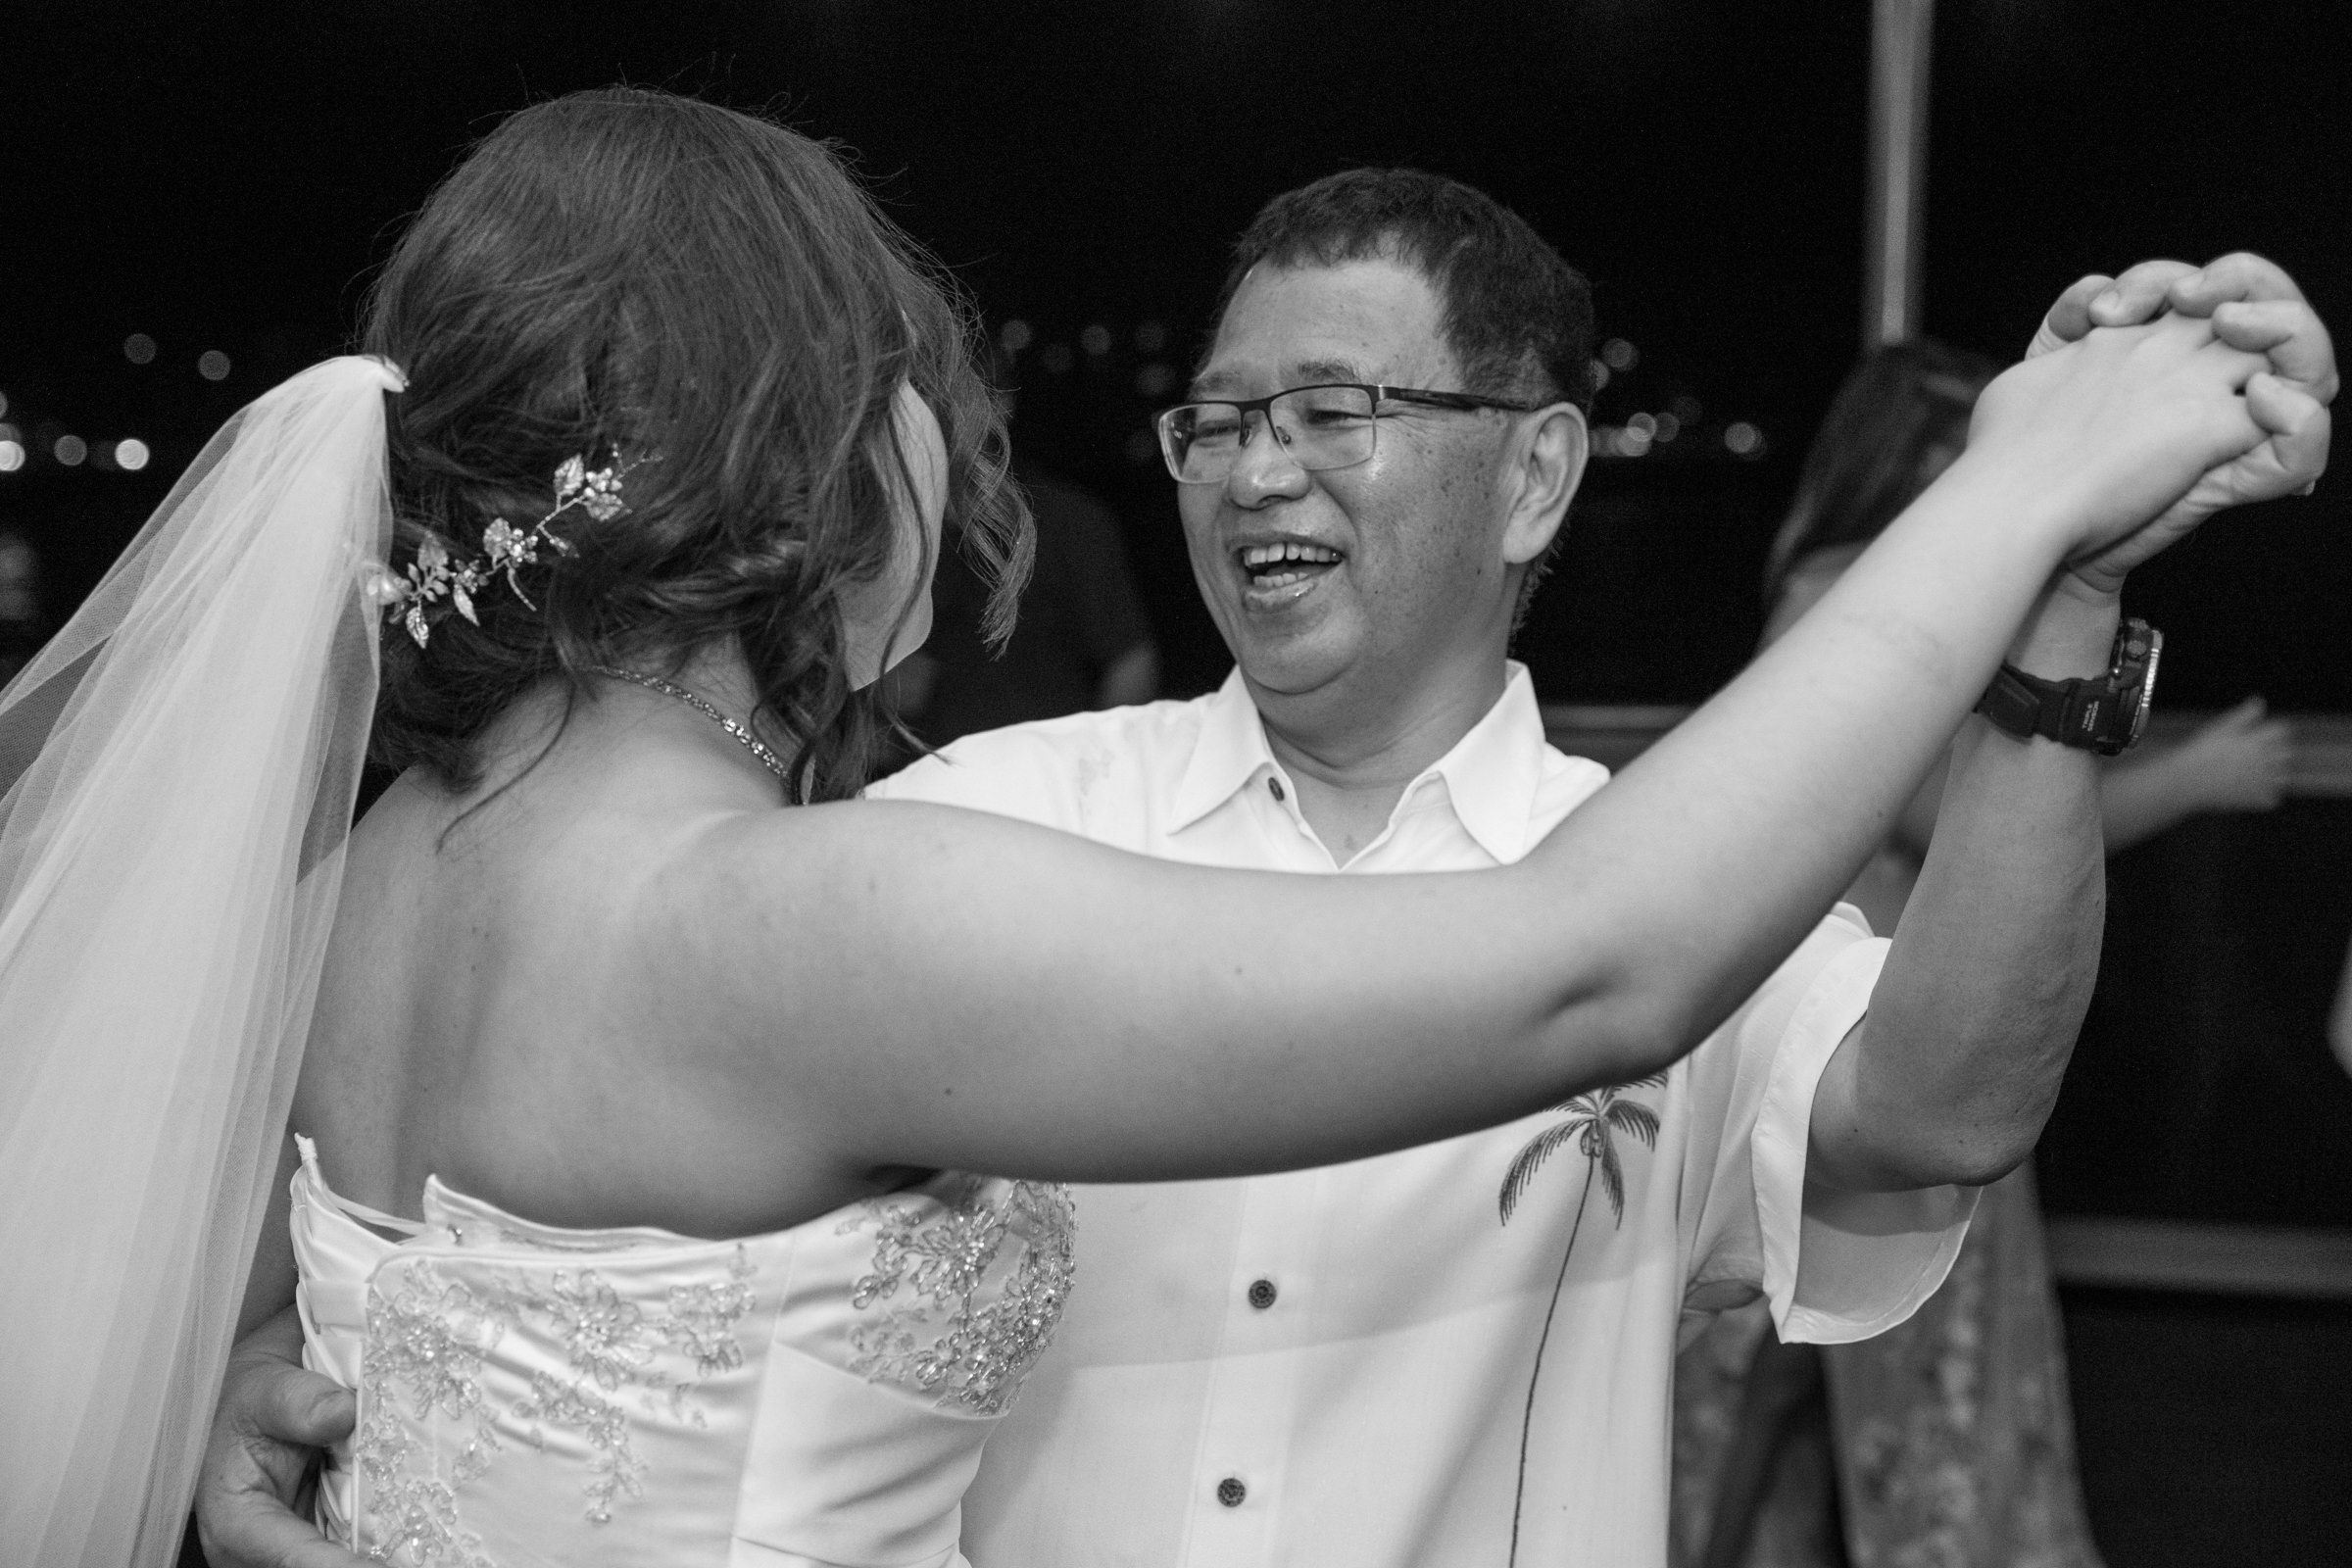 wedding-photographer-photography-destination-hawaii-lake-tahoe-reception-father-daughter-dance